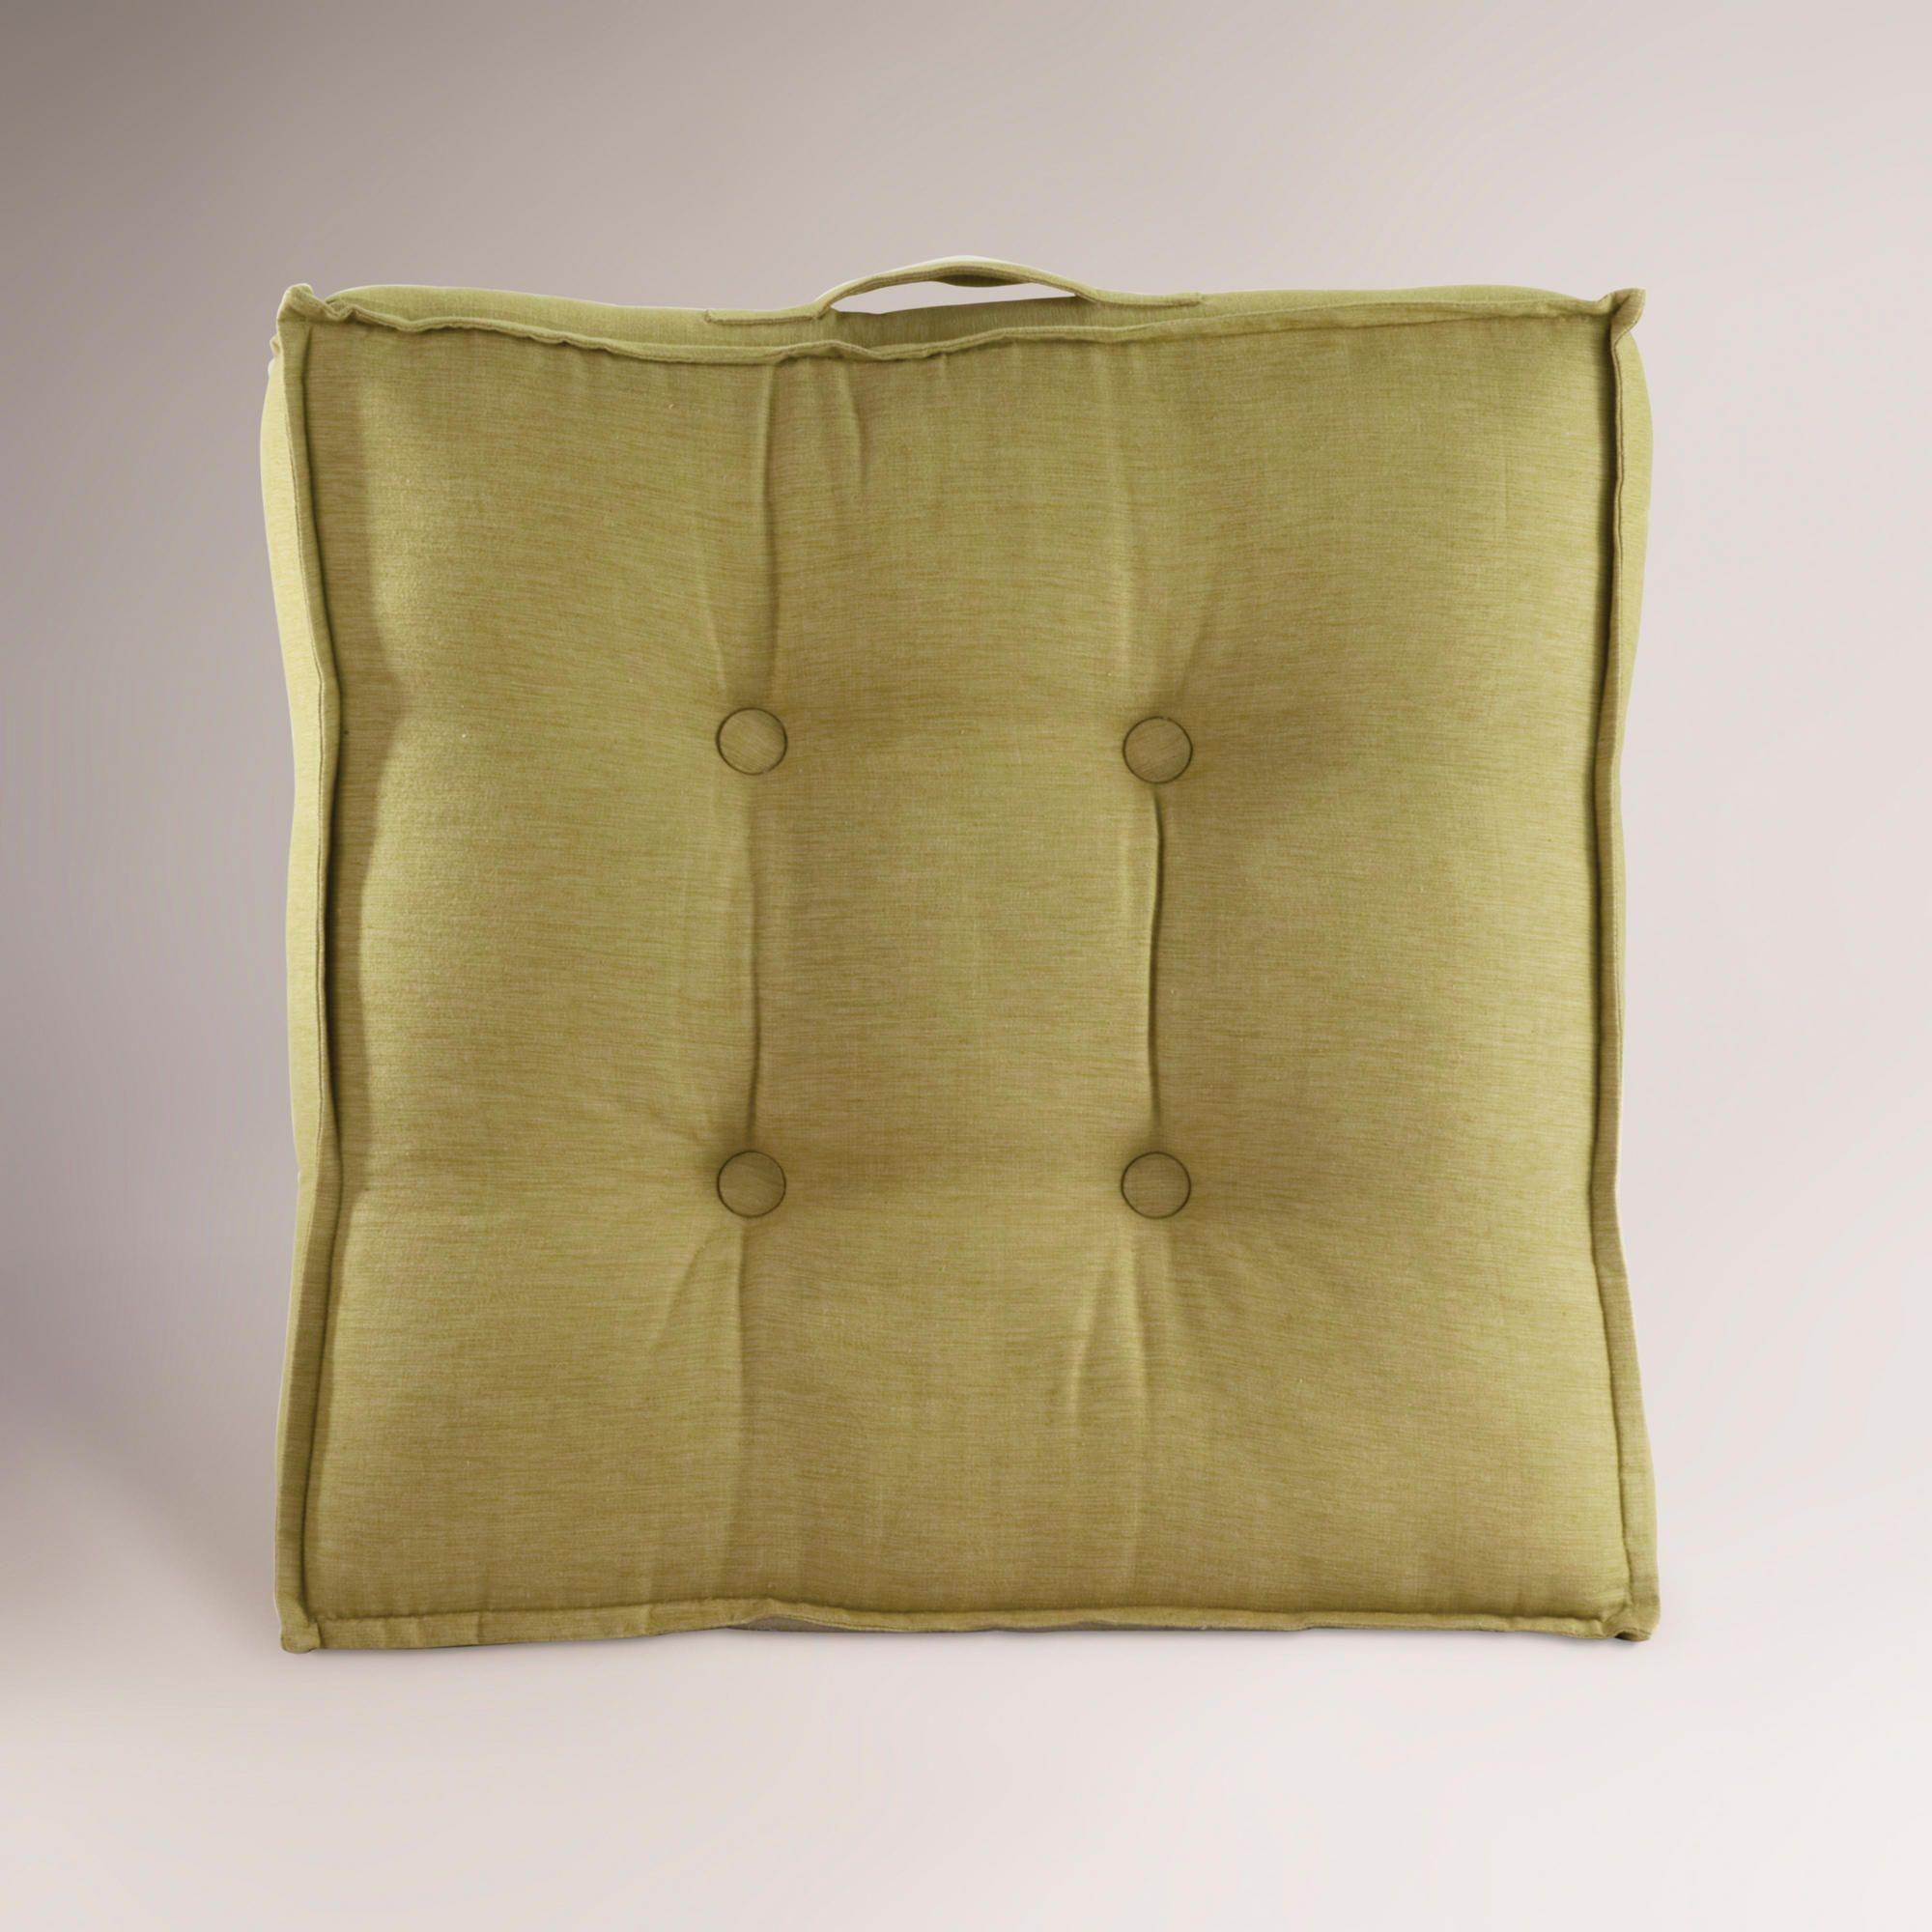 Green Khadi Tufted Floor Cushion | Floor pillows, Living rooms and ...